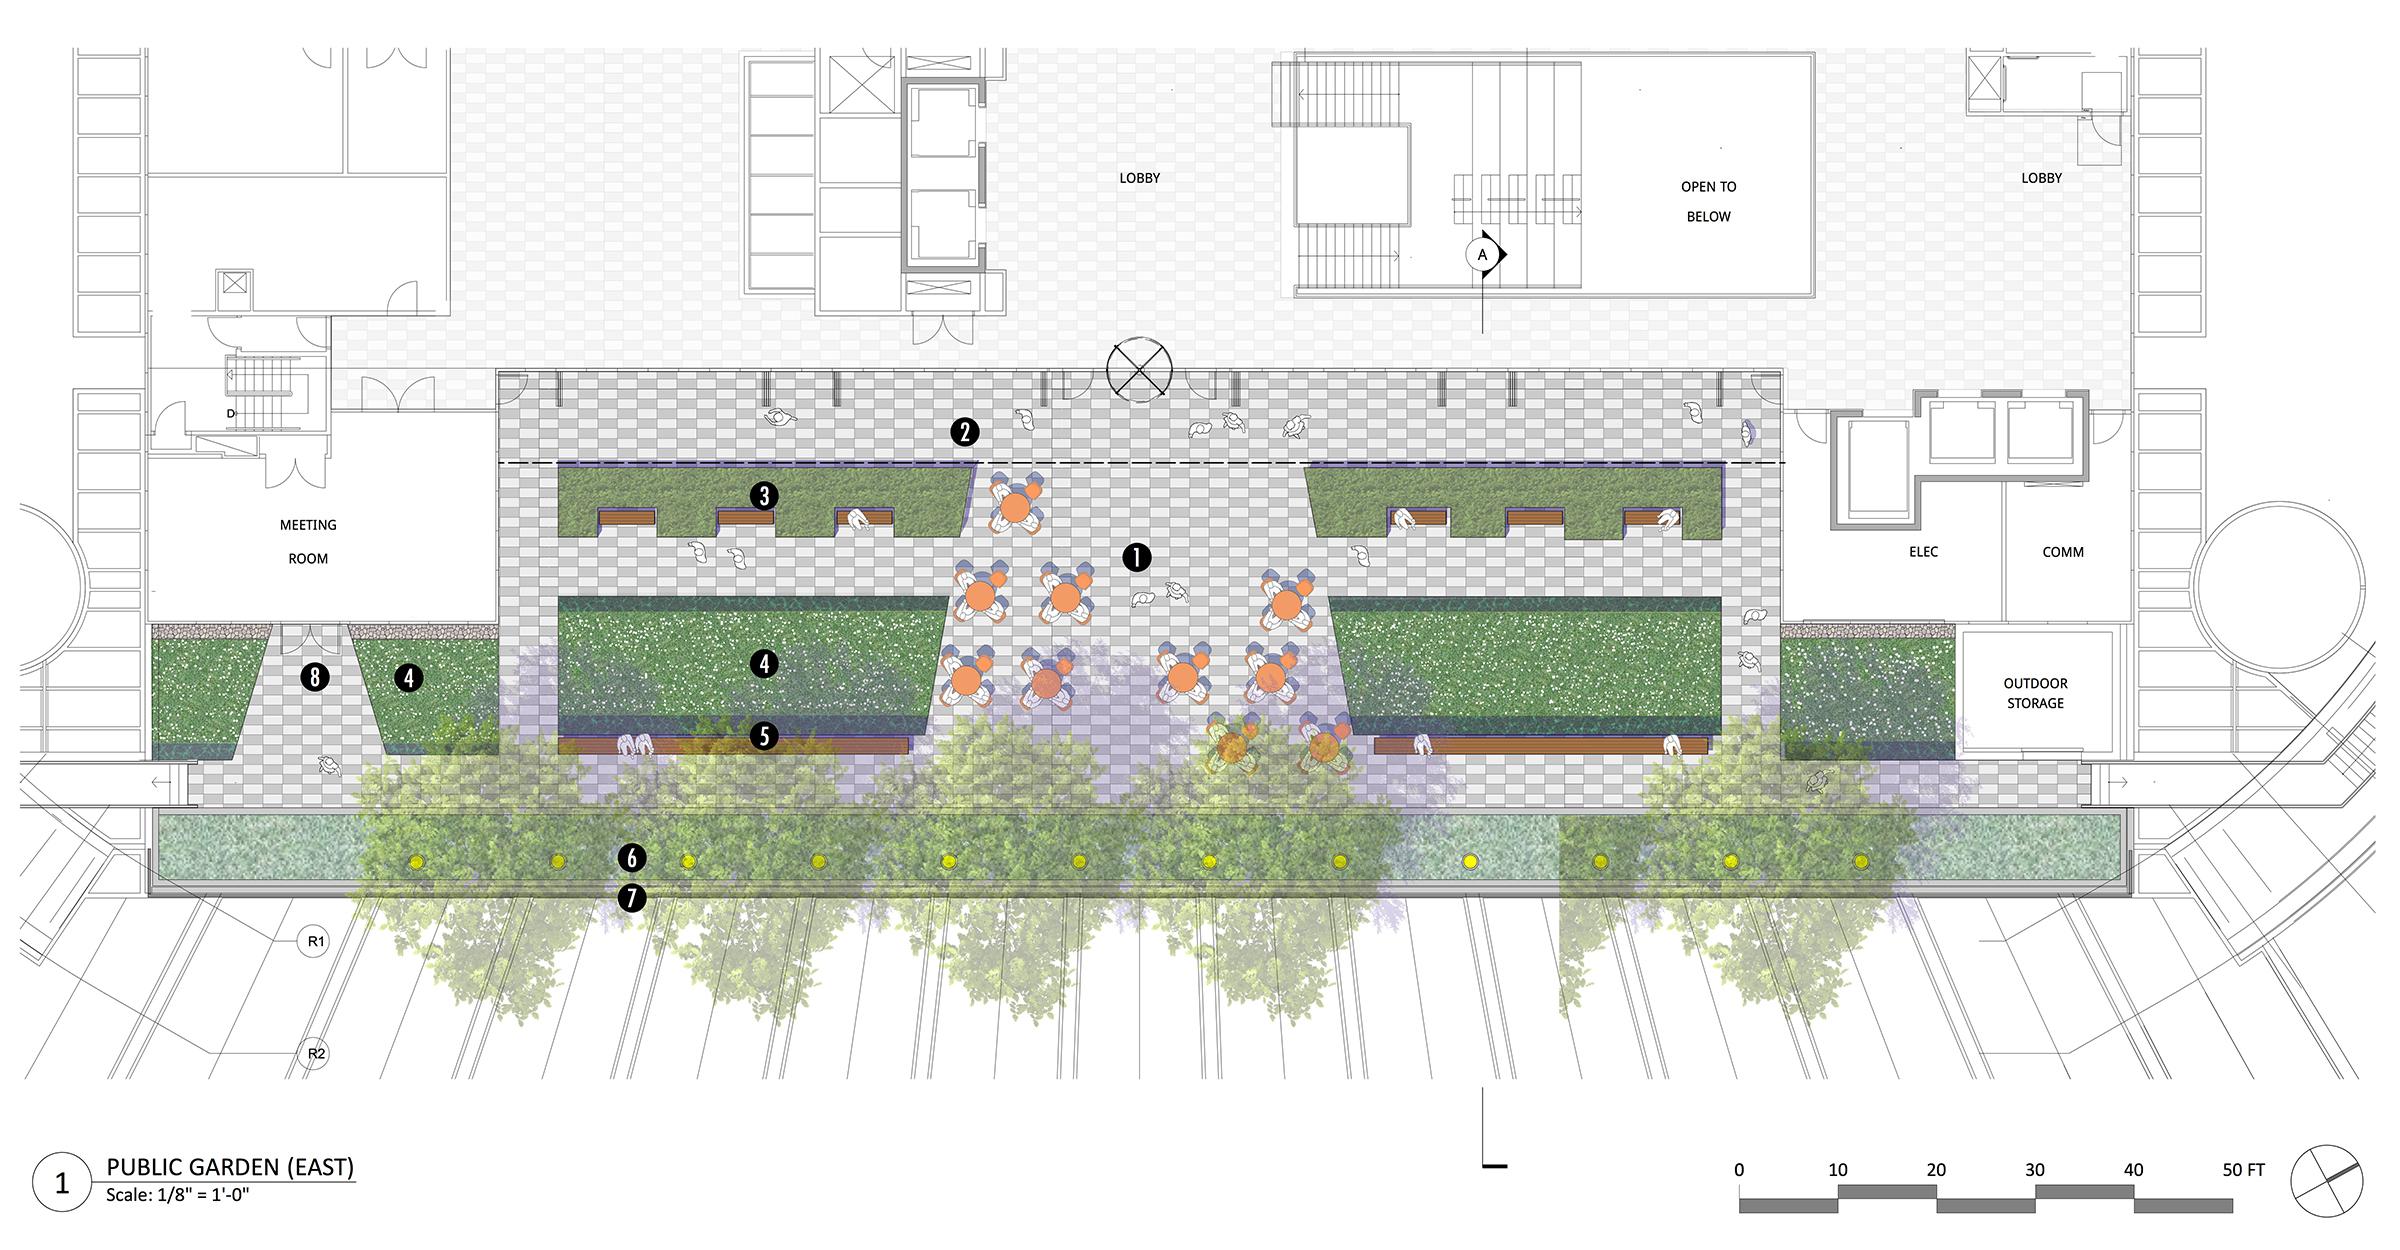 06-465 16-04-04 Roof plan1